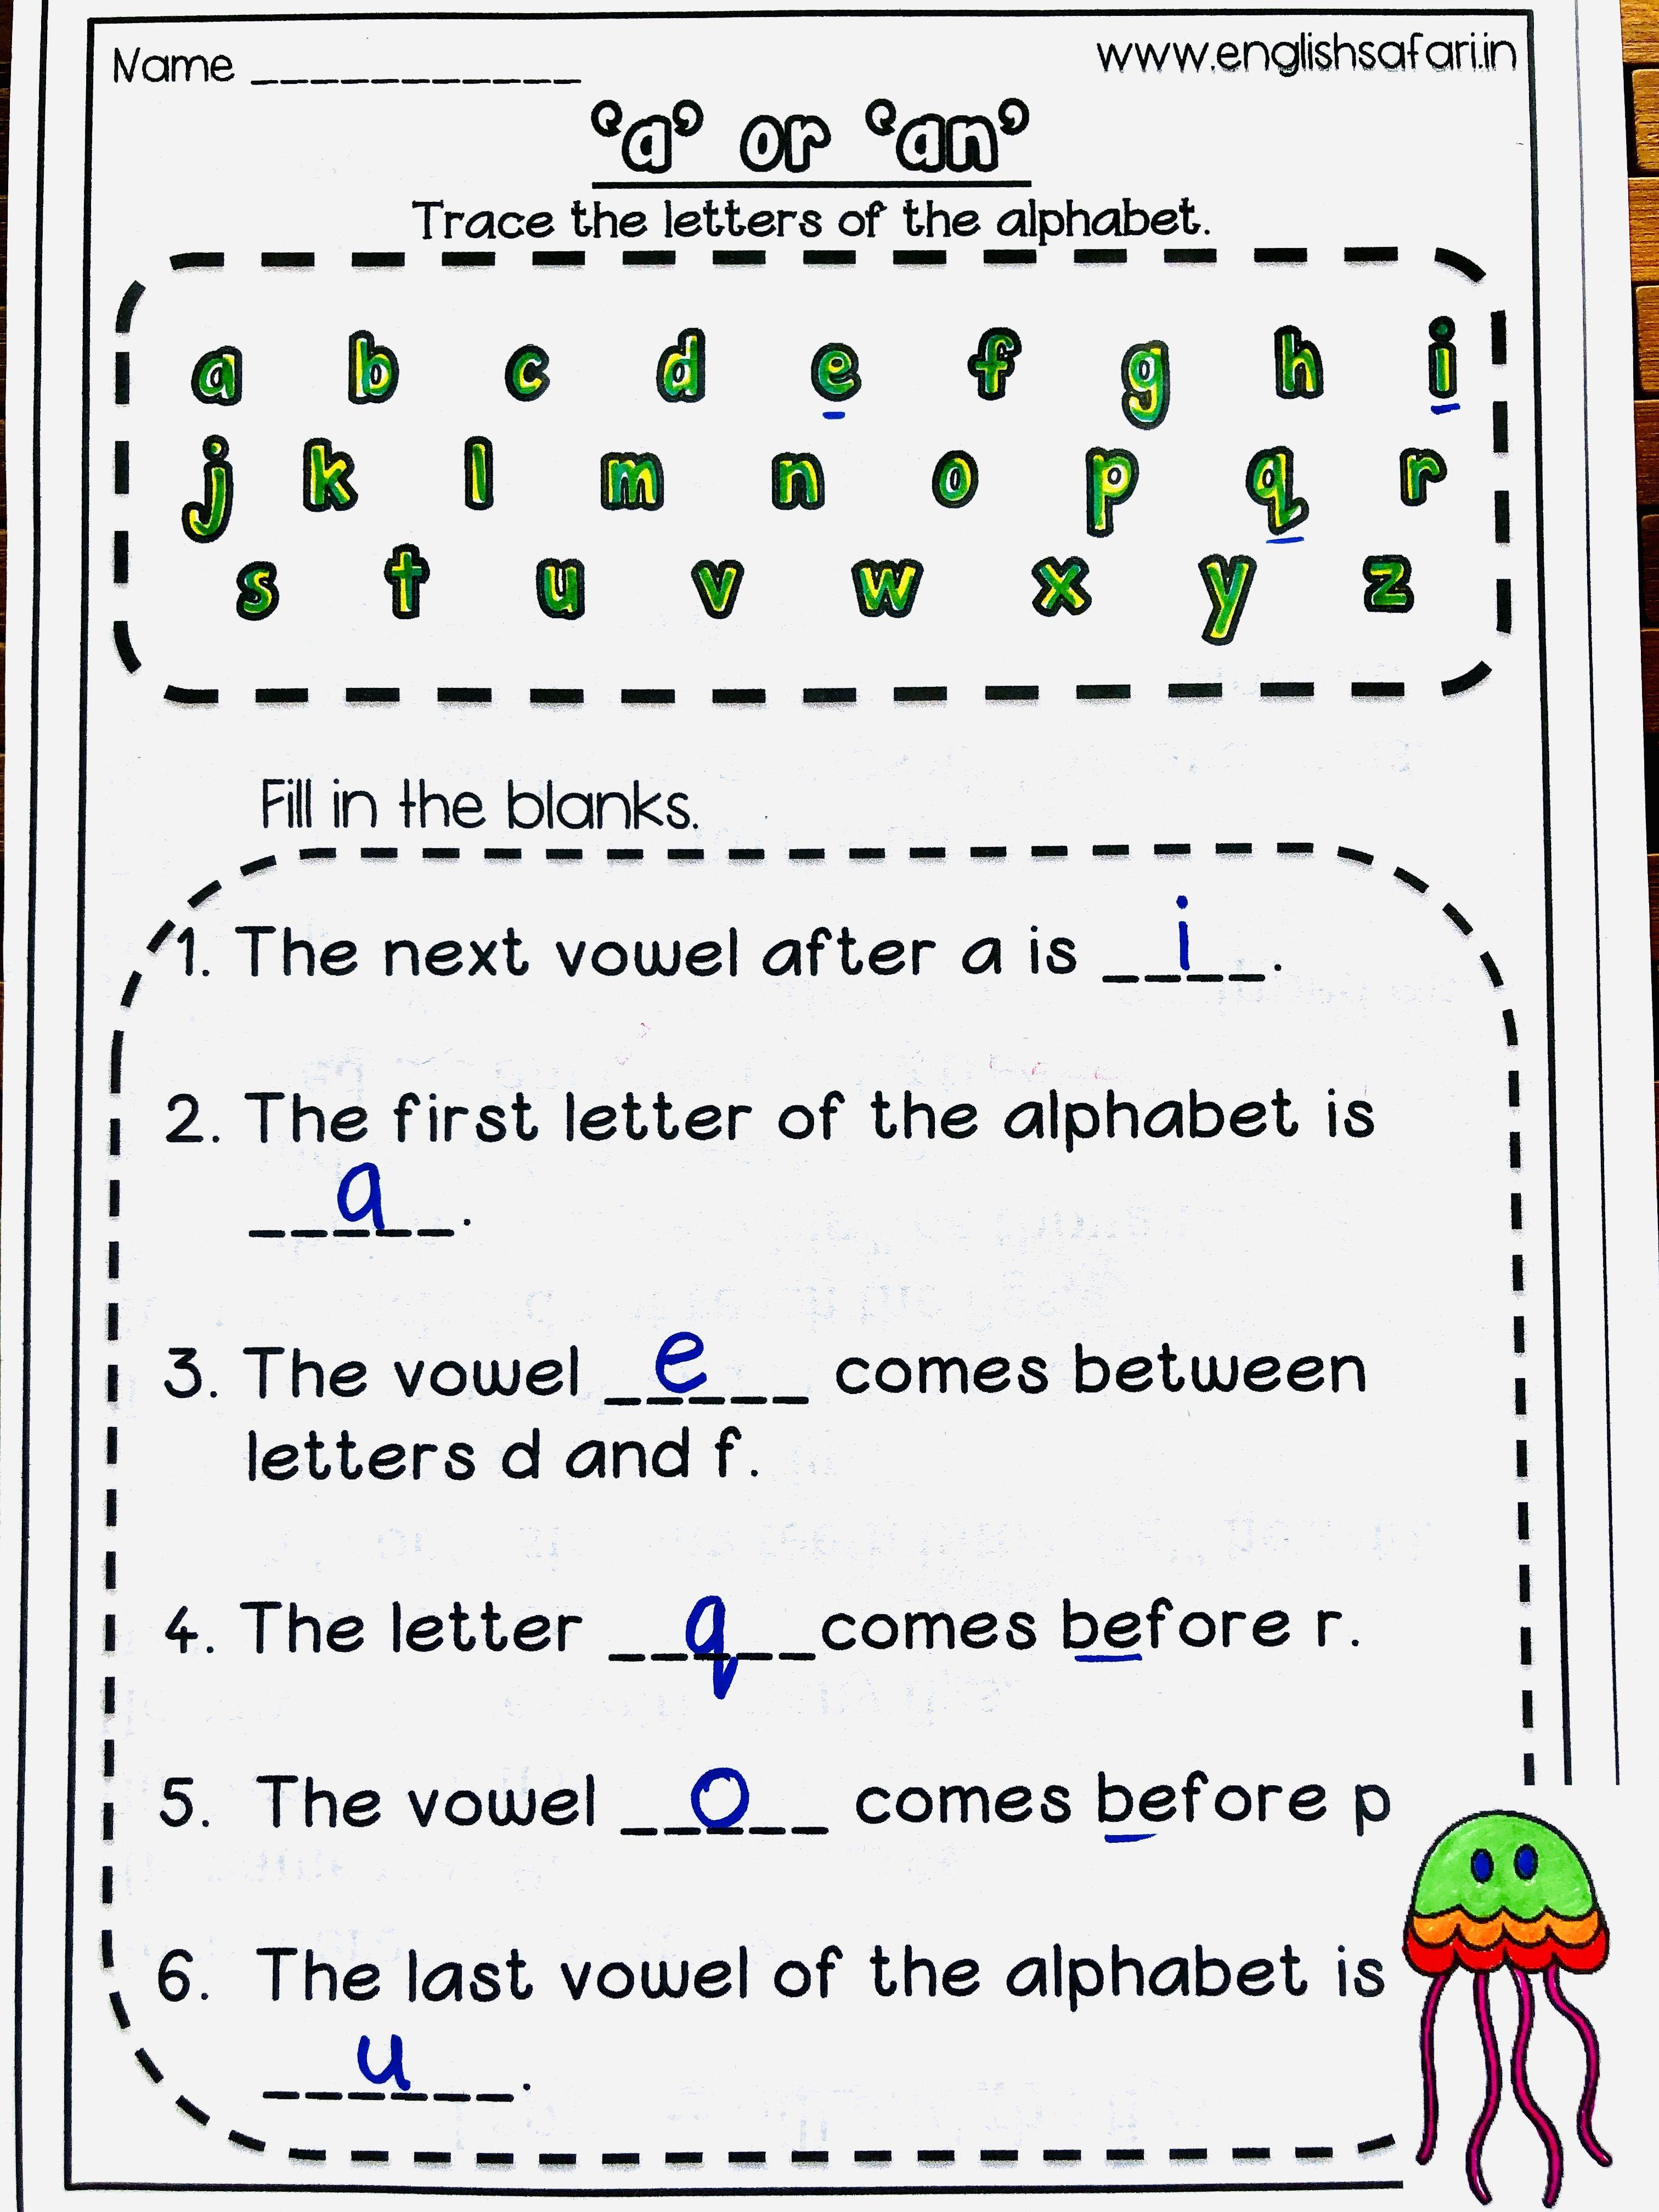 Free Consonants And Vowels Worksheet Englishsafari